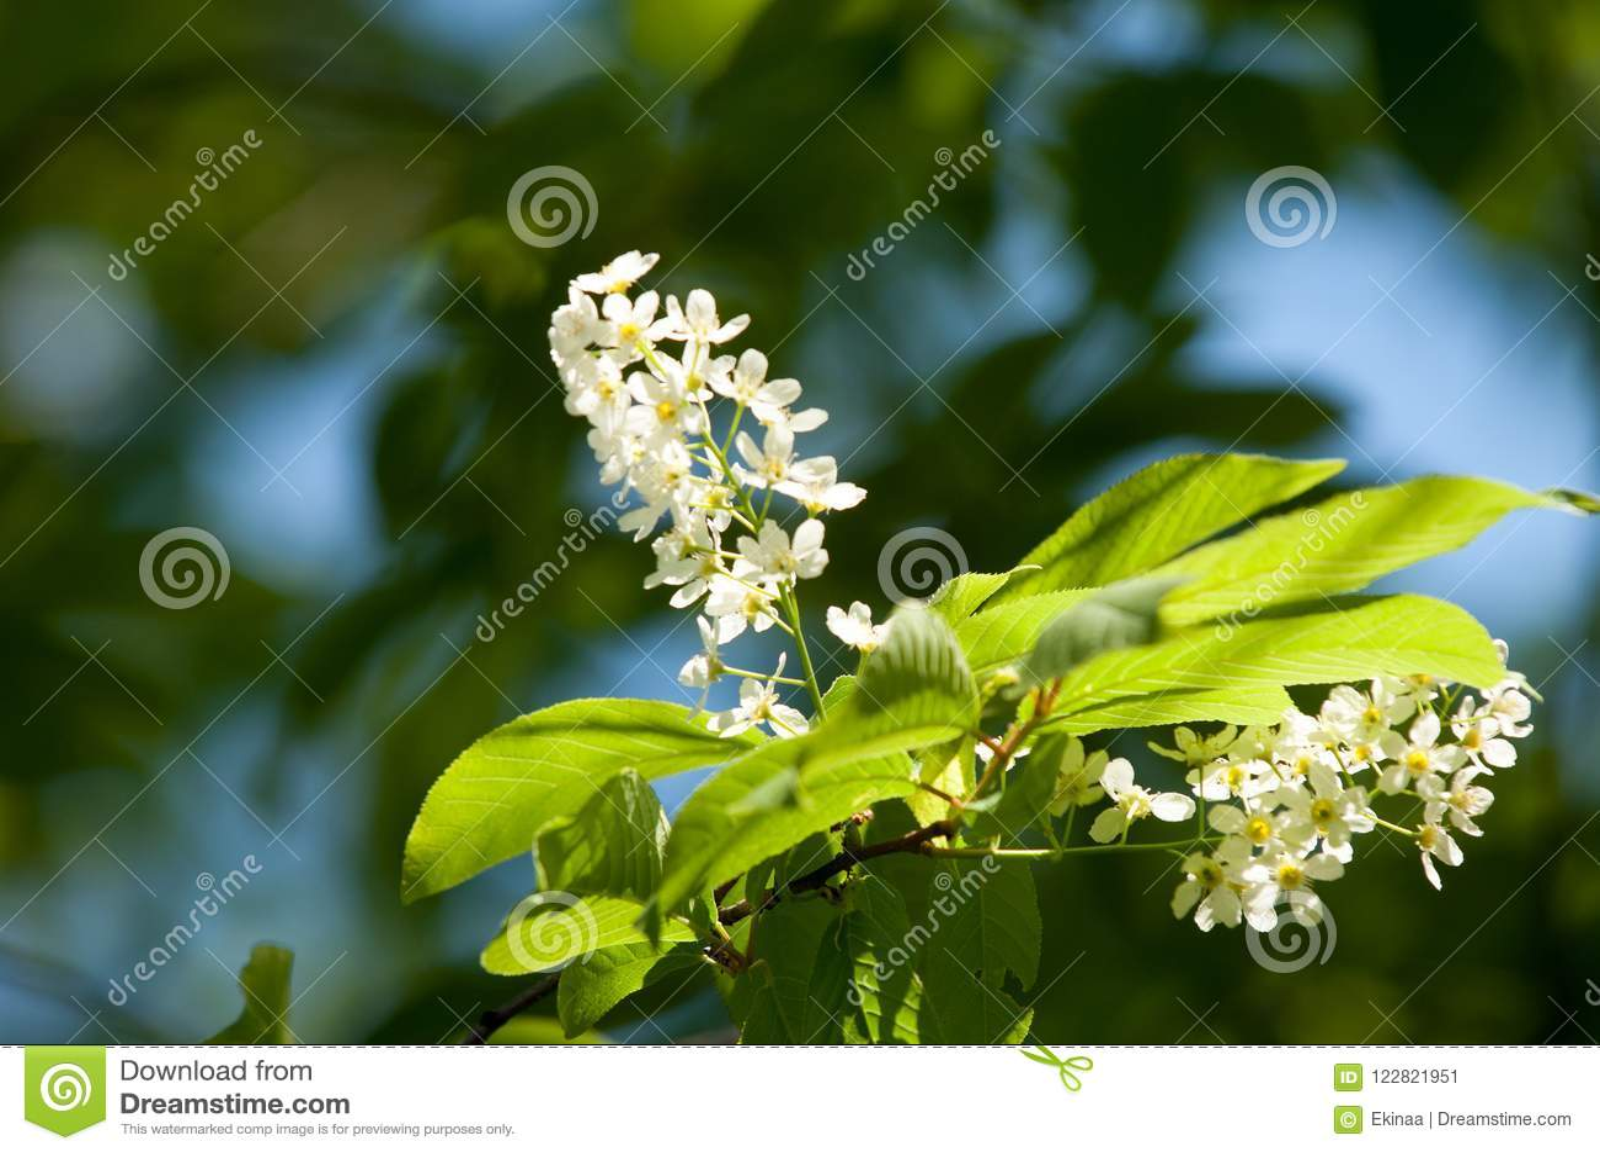 Spring Flowers Bird Spring Flowers Bird Cherry A Tree With White